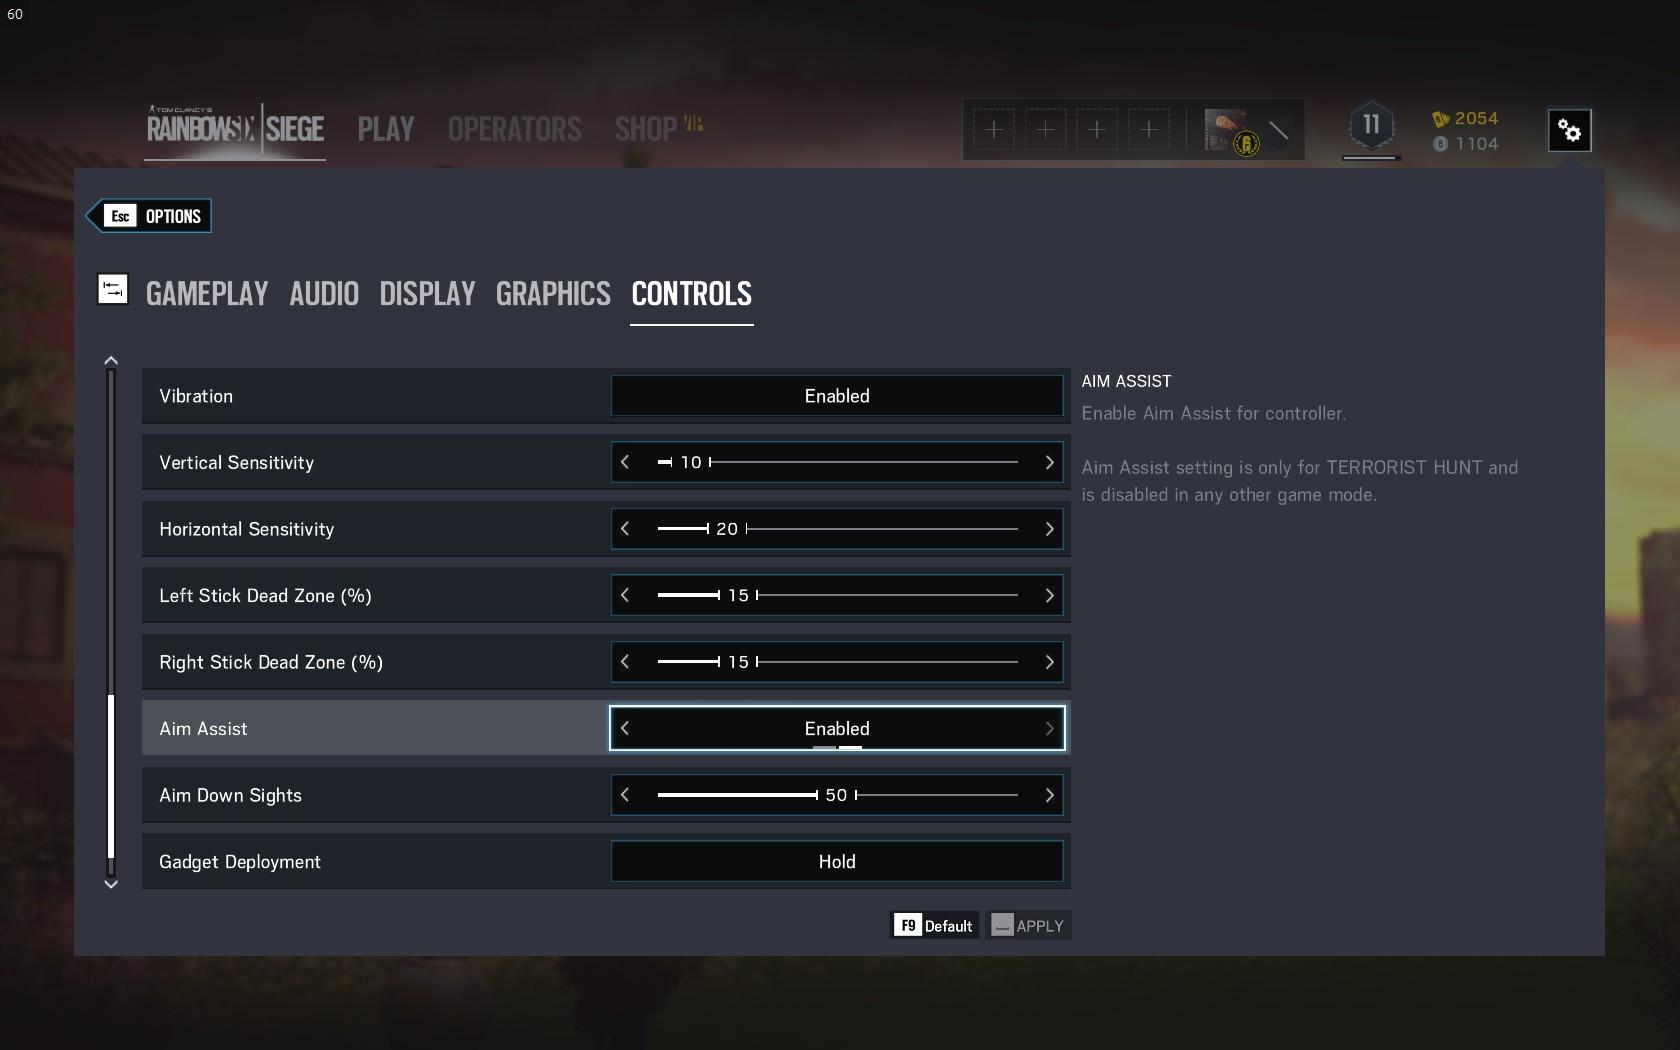 Enabling aim assist in Rainbow Six: Siege - Ubisoft Support